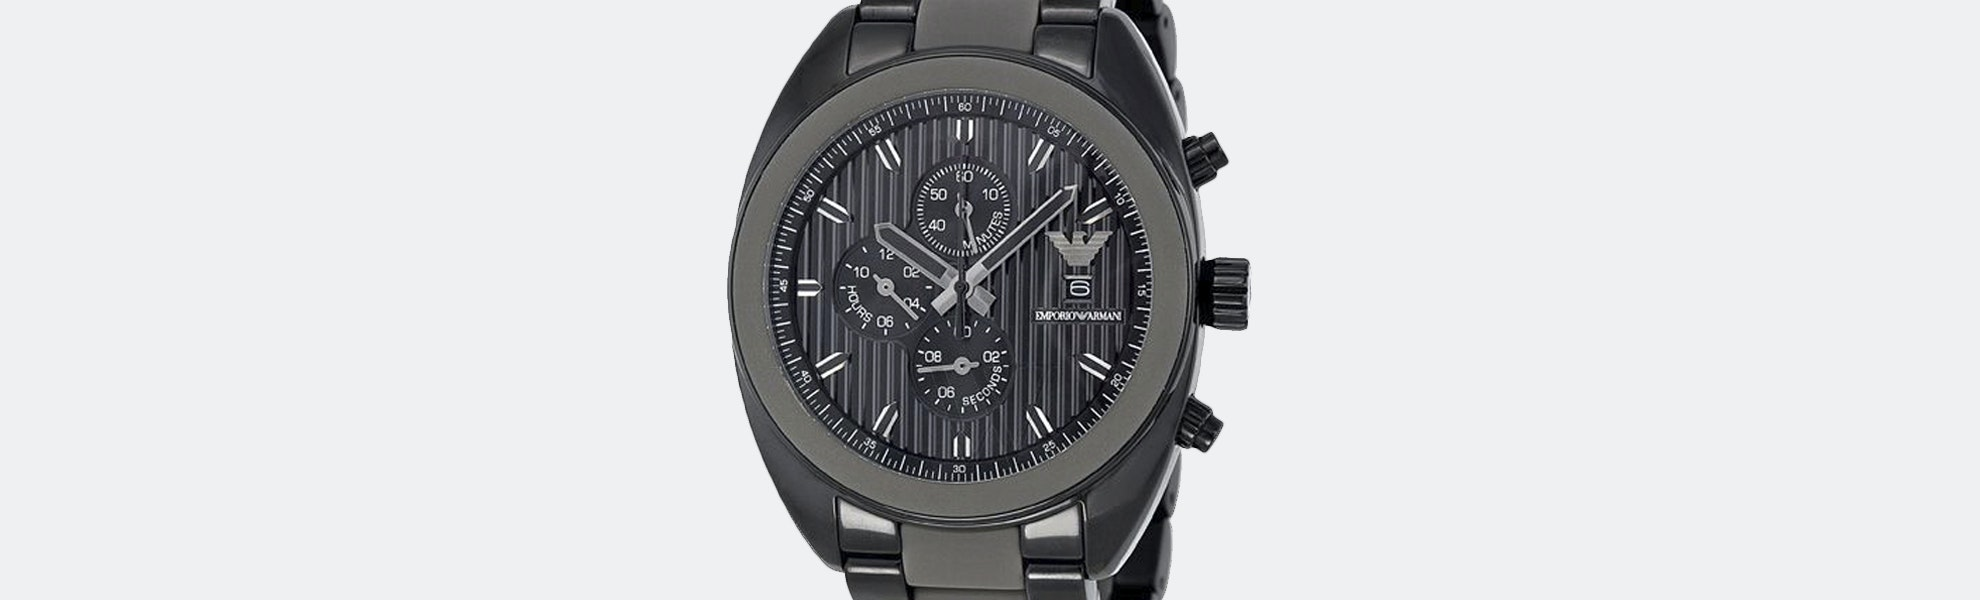 Emporio Armani Sportivo Quartz Watch